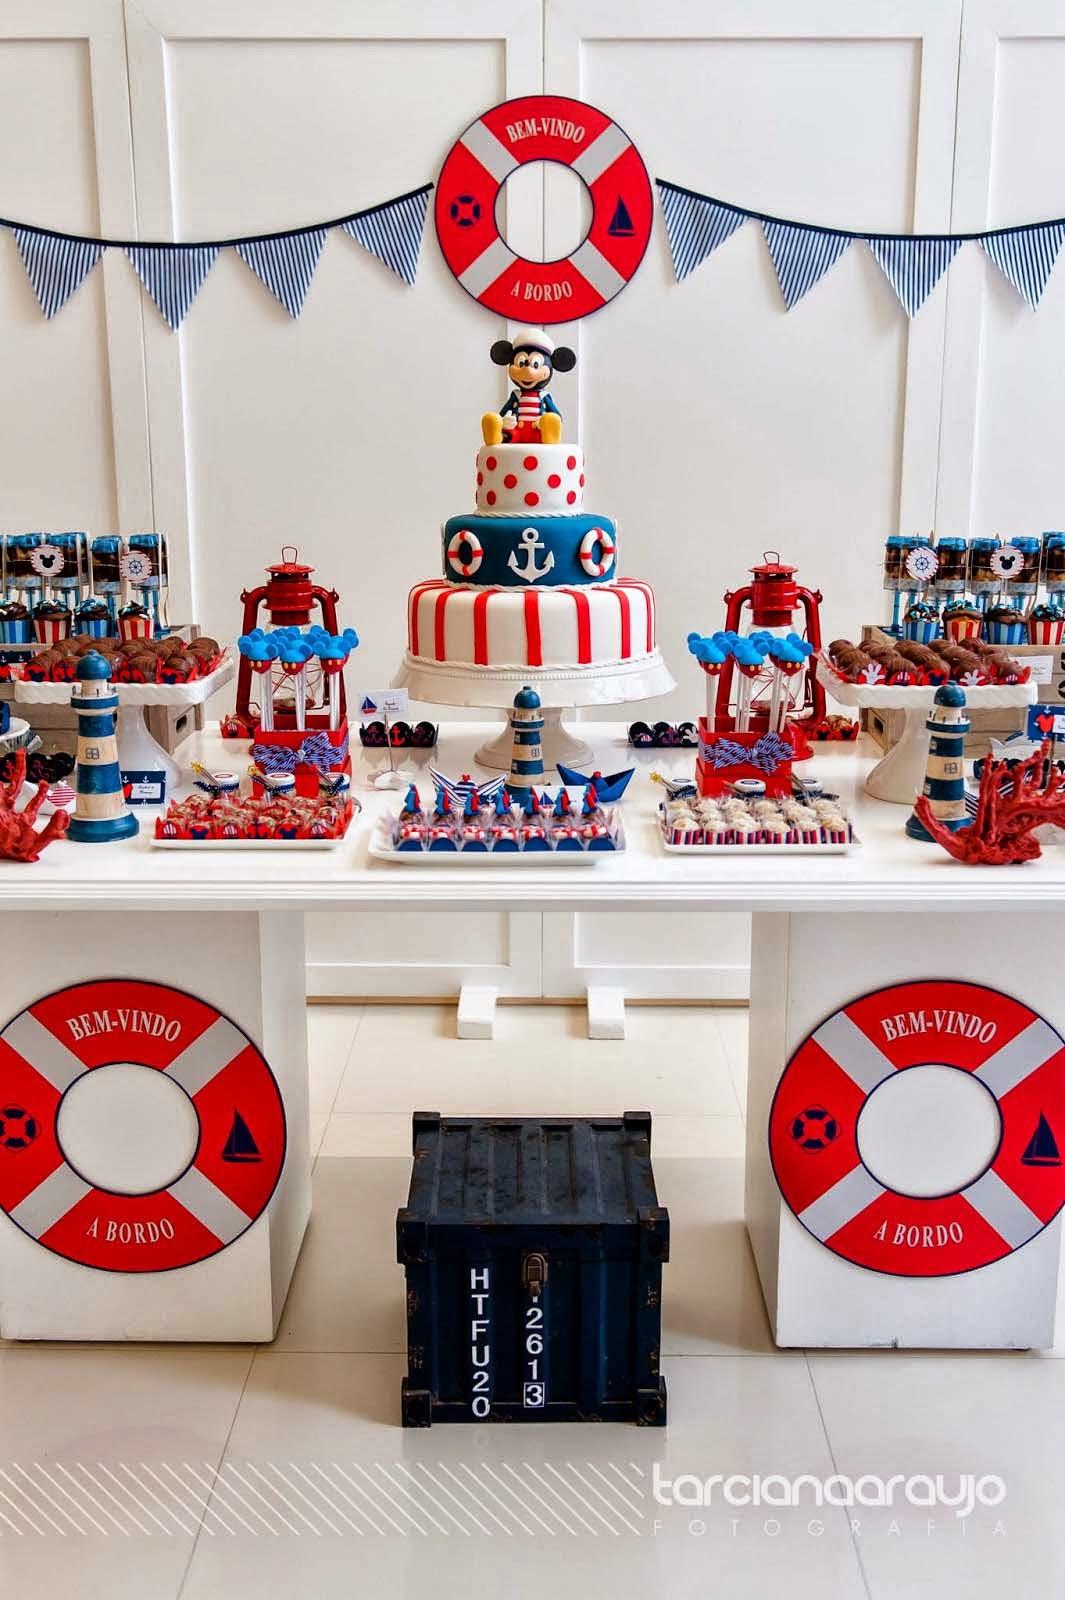 Decorao festa infantil tema mickey marinheiro blog bella fiore decorao altavistaventures Image collections